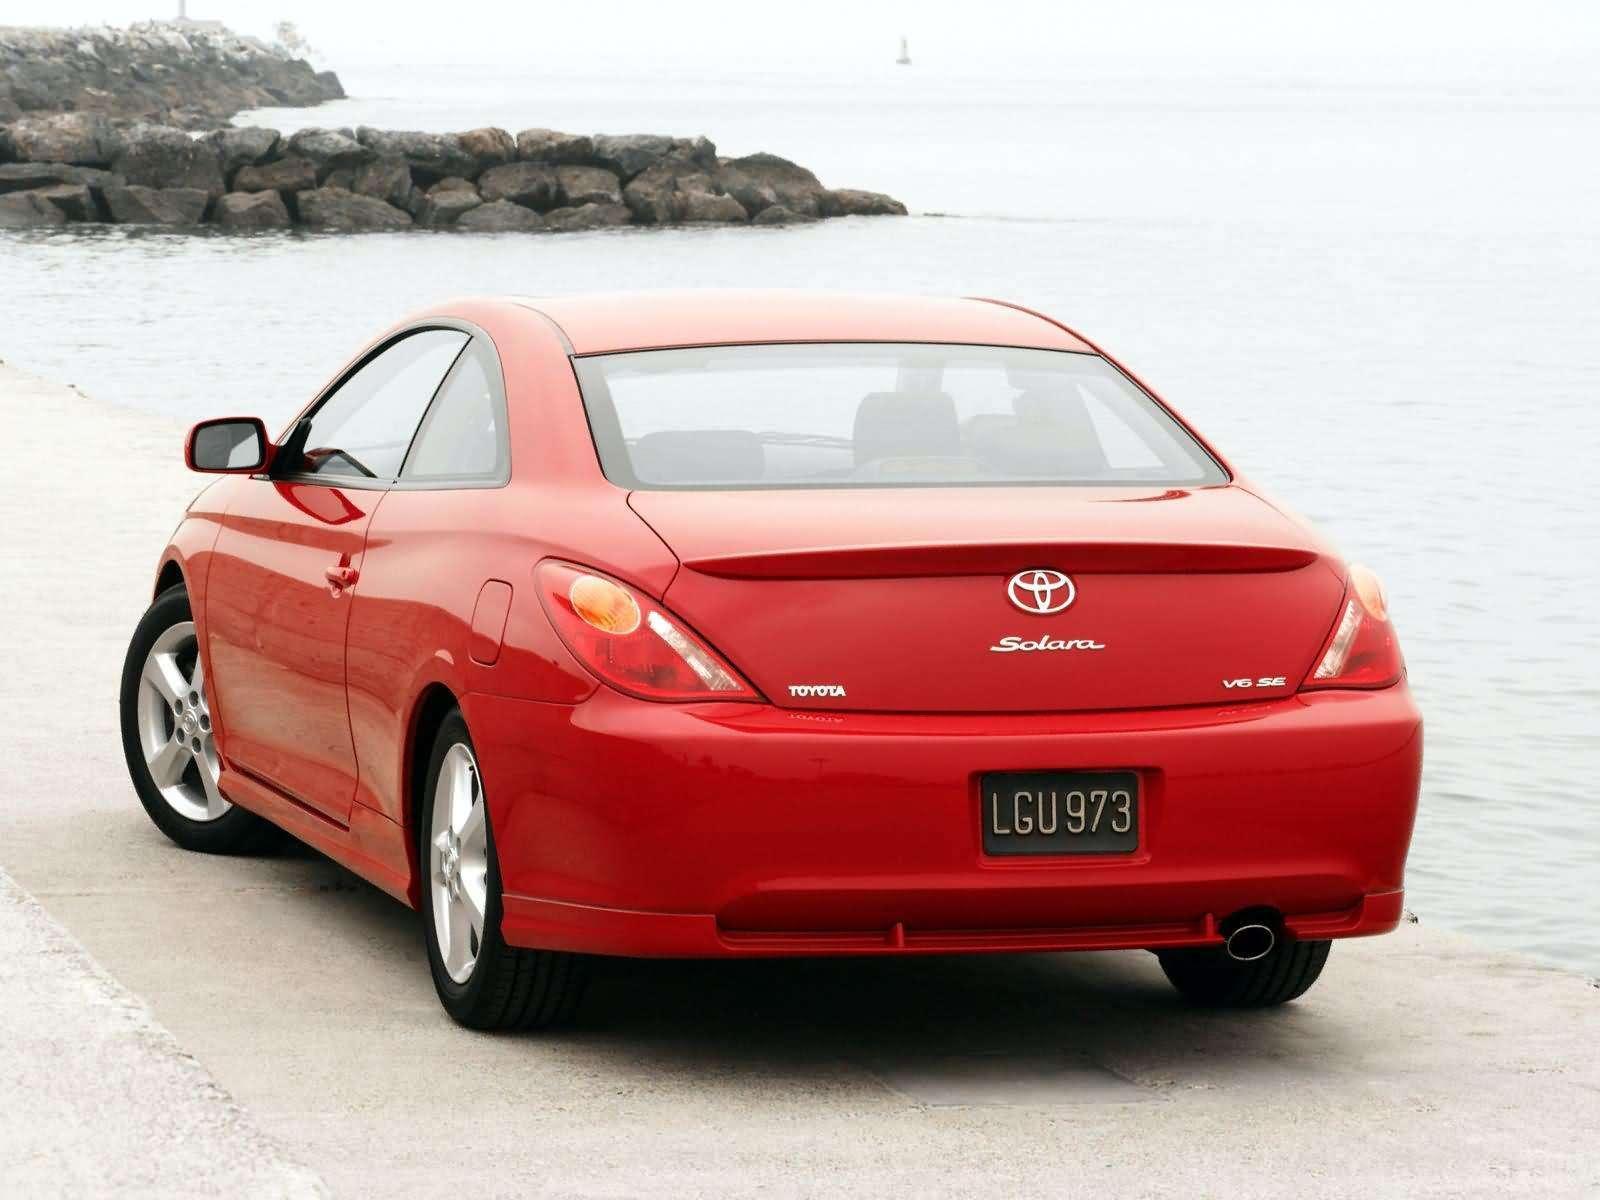 Toyota Camry Solara I 1998 - 2003 Coupe #5